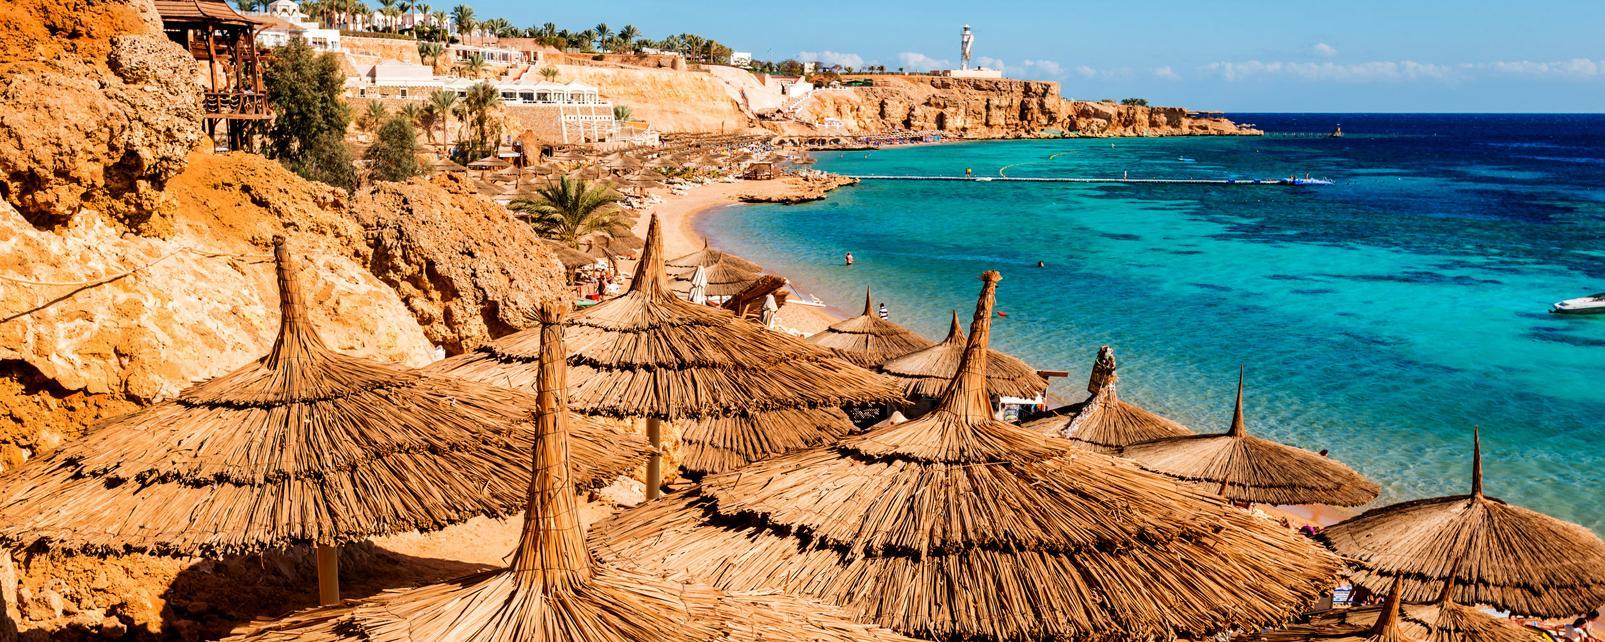 Egypte Sharm El Sheikh